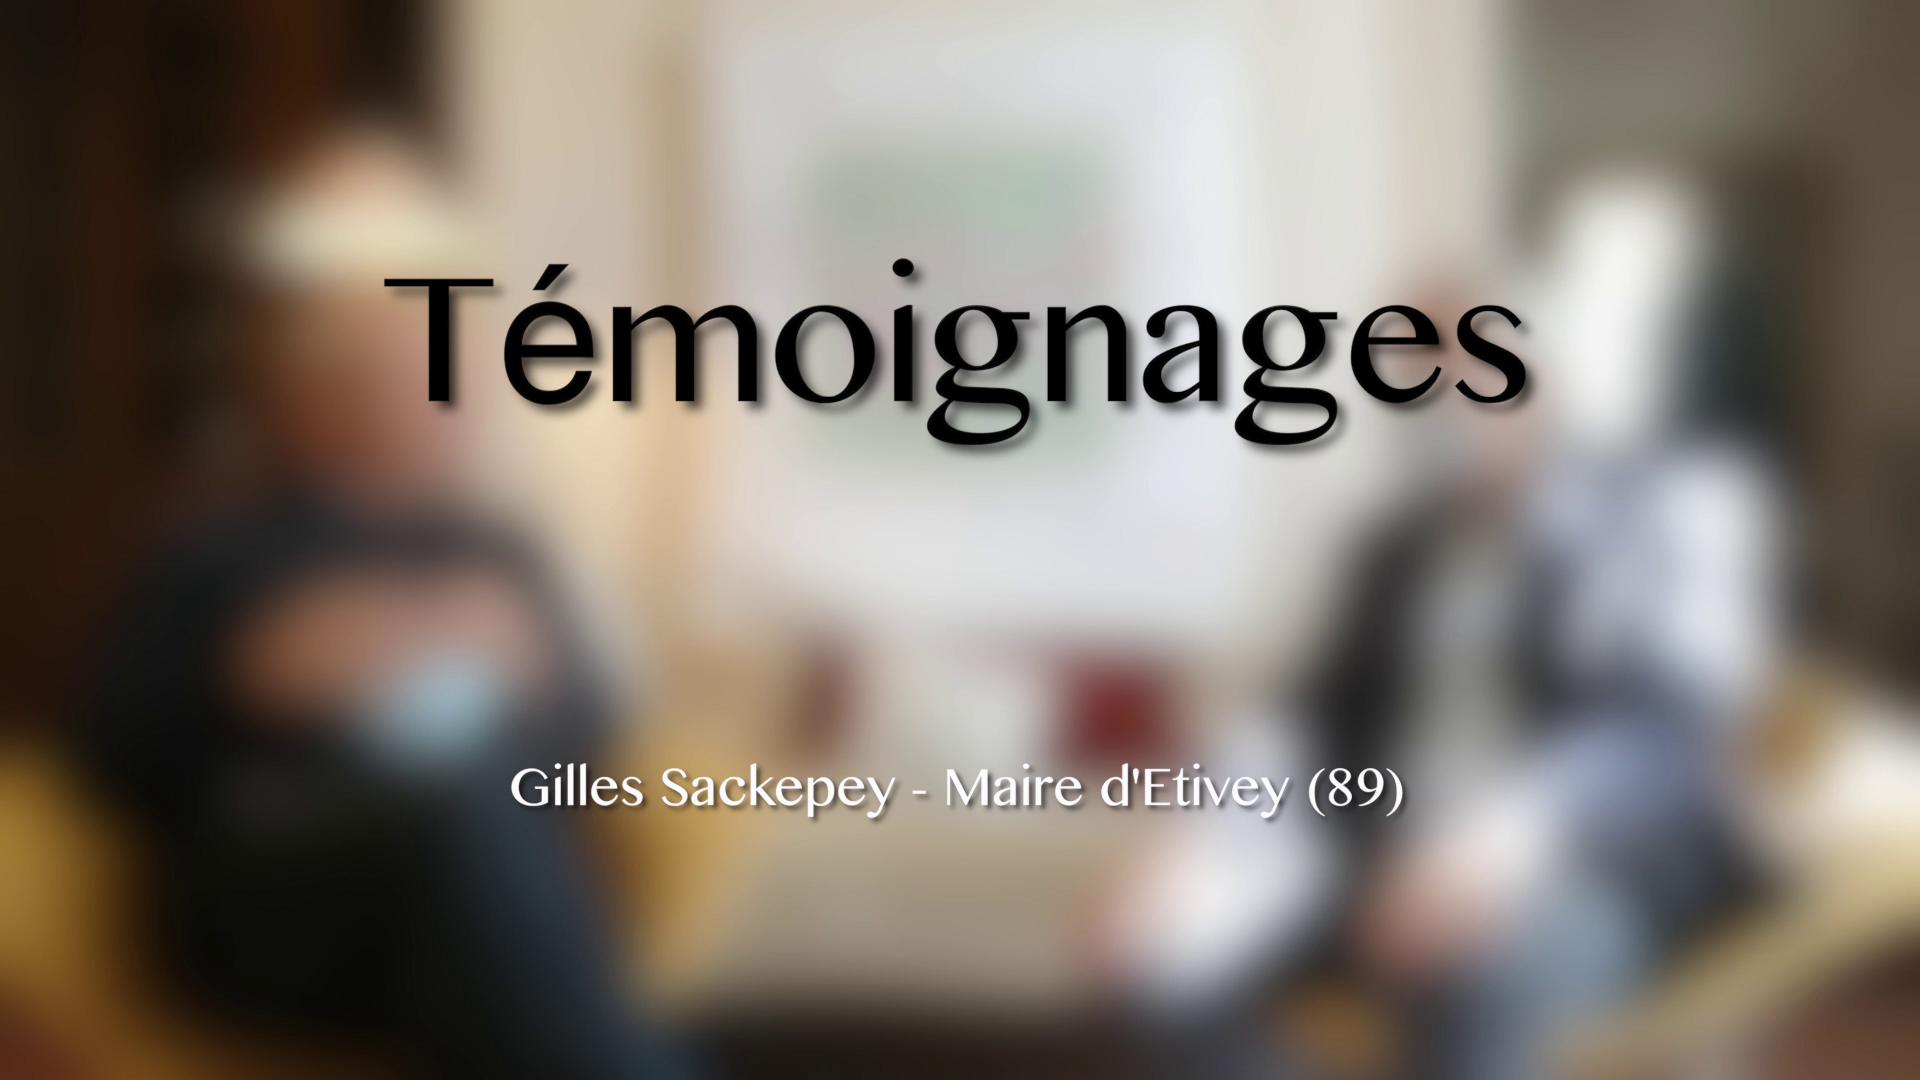 Eoliennes - Témoignage 3/4 - Gilles Sackepey - Maire d'Etivey